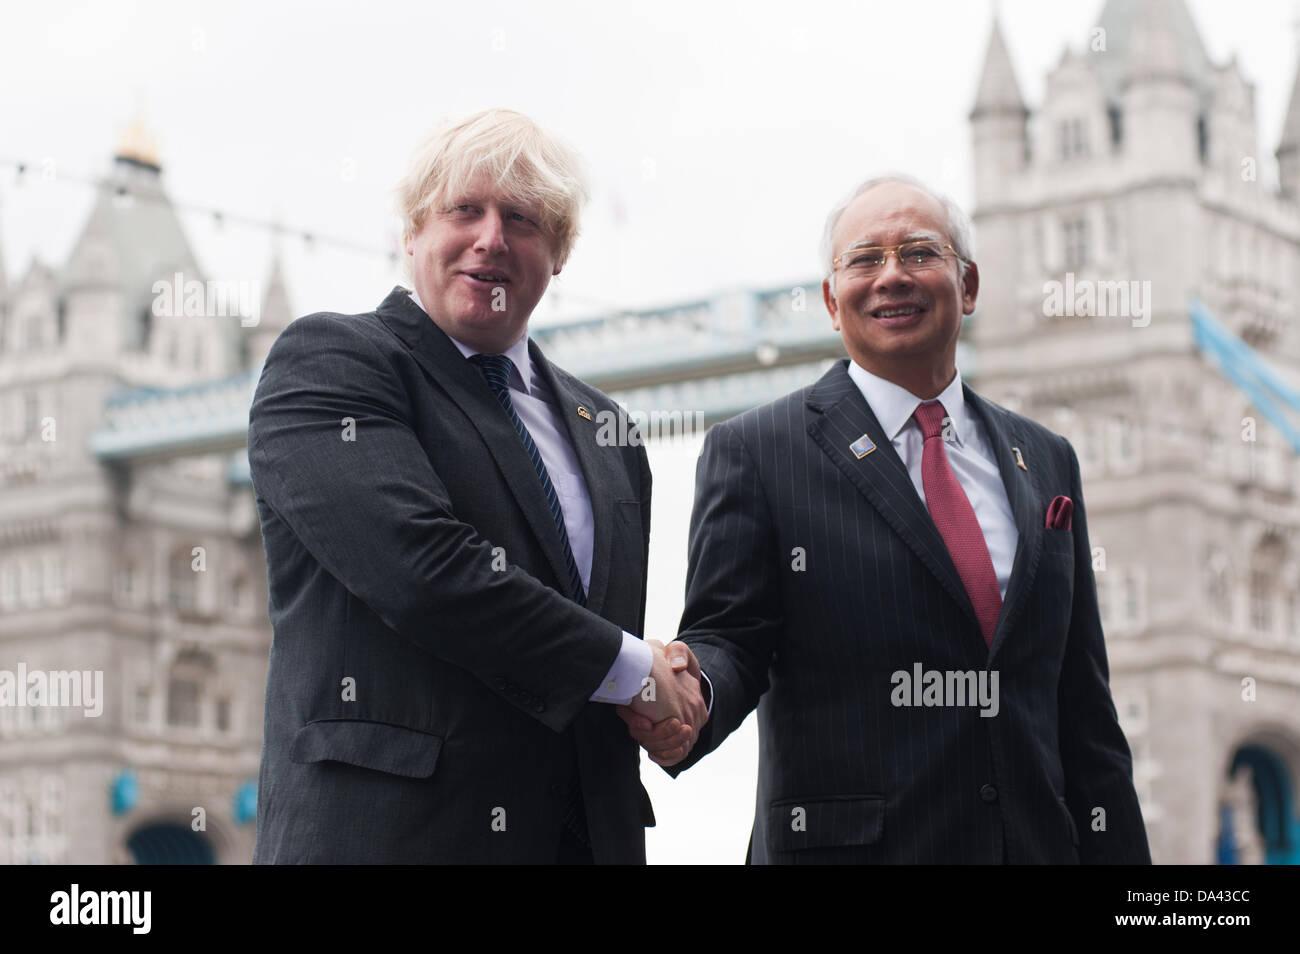 London, UK – 3 July 2013: The Prime Minister of Malaysia, Honourable Dato' Sri Mohd Najib Tun Abdul Razak, and the Stock Photo